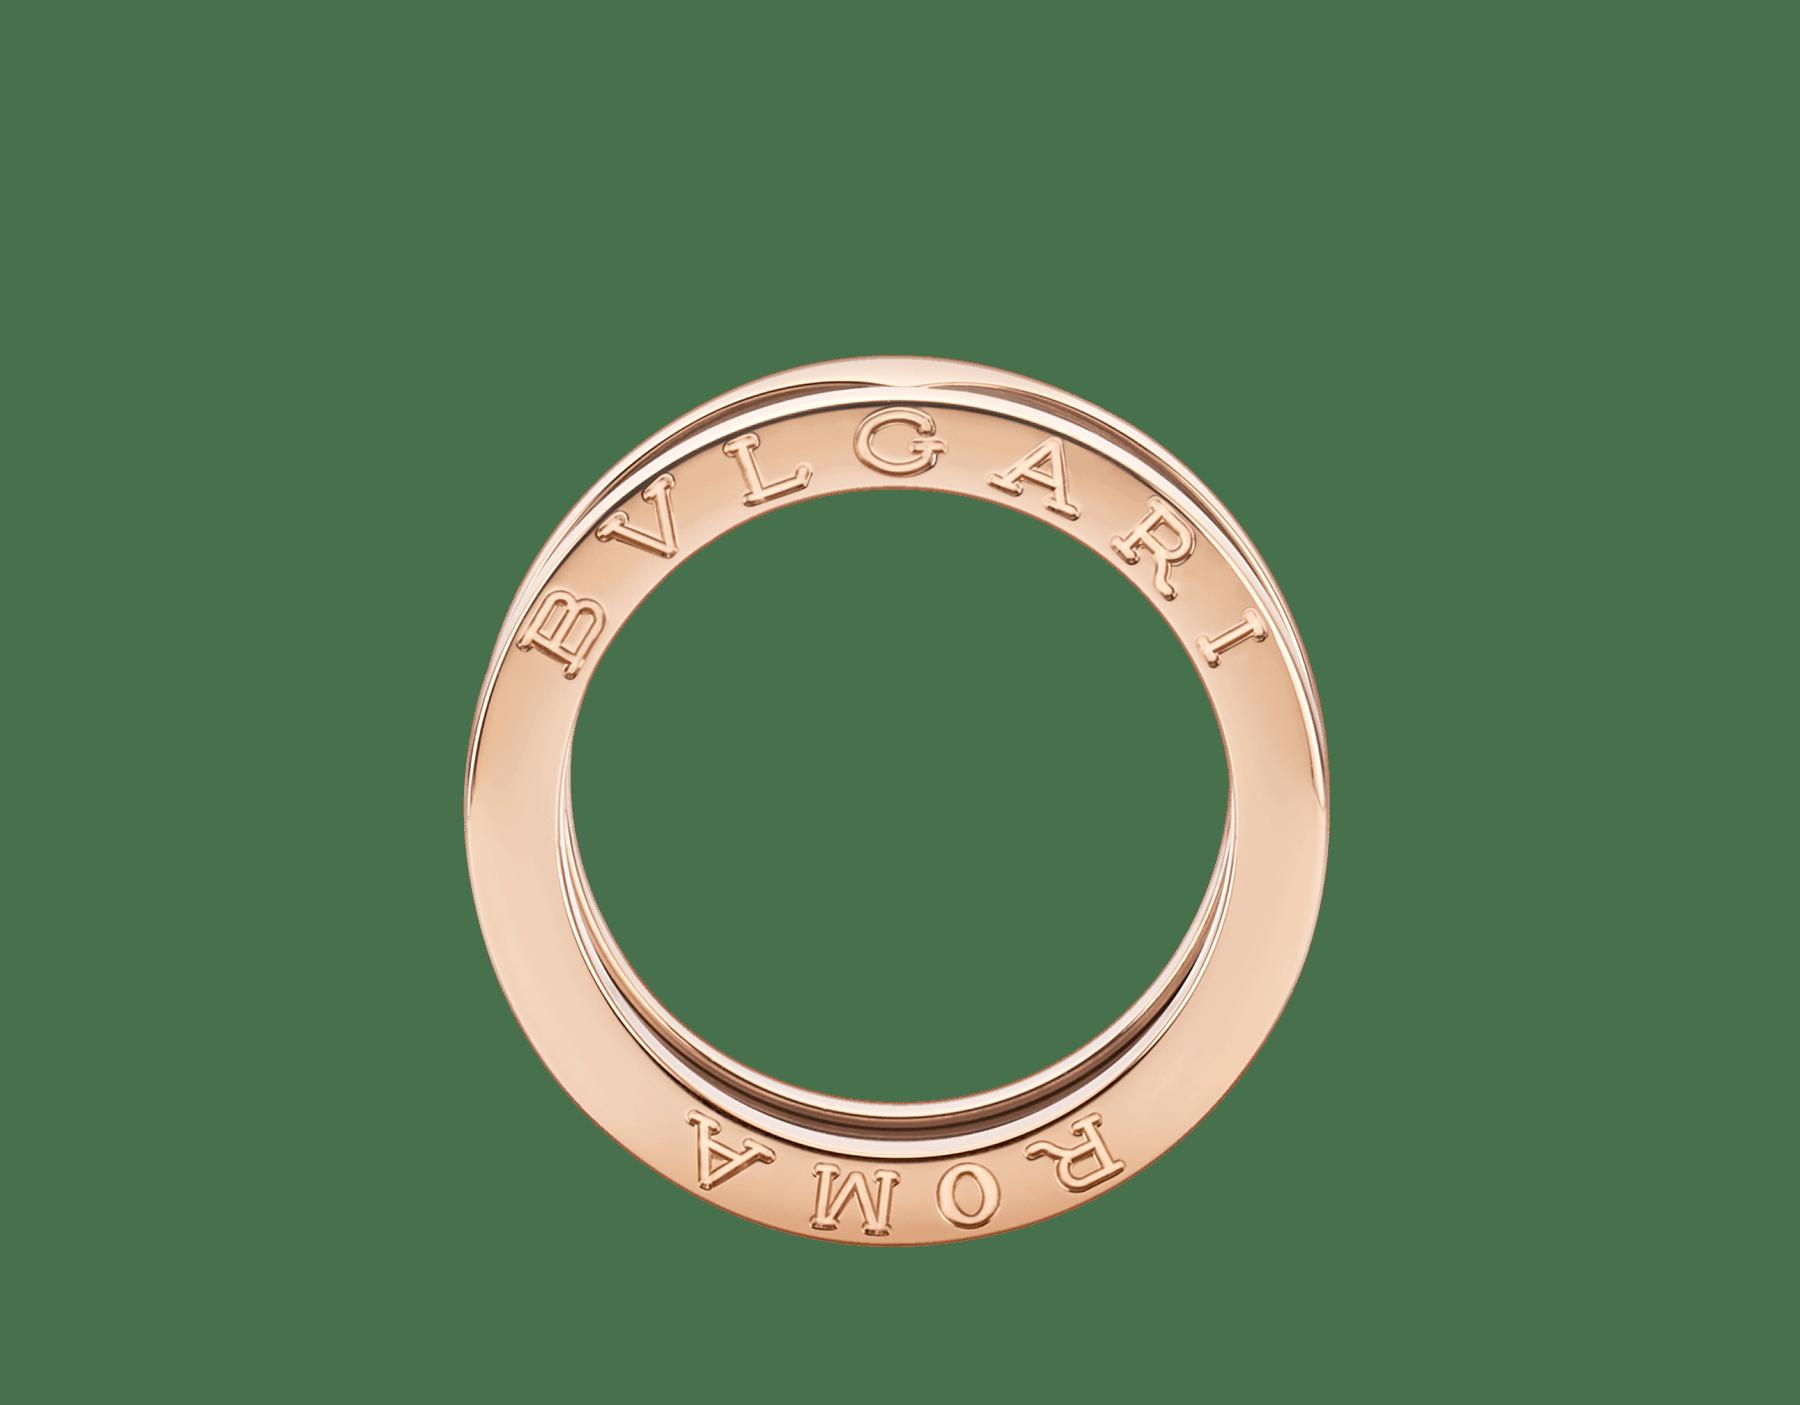 18Kピンクゴールドおよびサーメット製ビー・ゼロワン 2バンドリング。 B-zero1-2-bands-AN857844 image 2